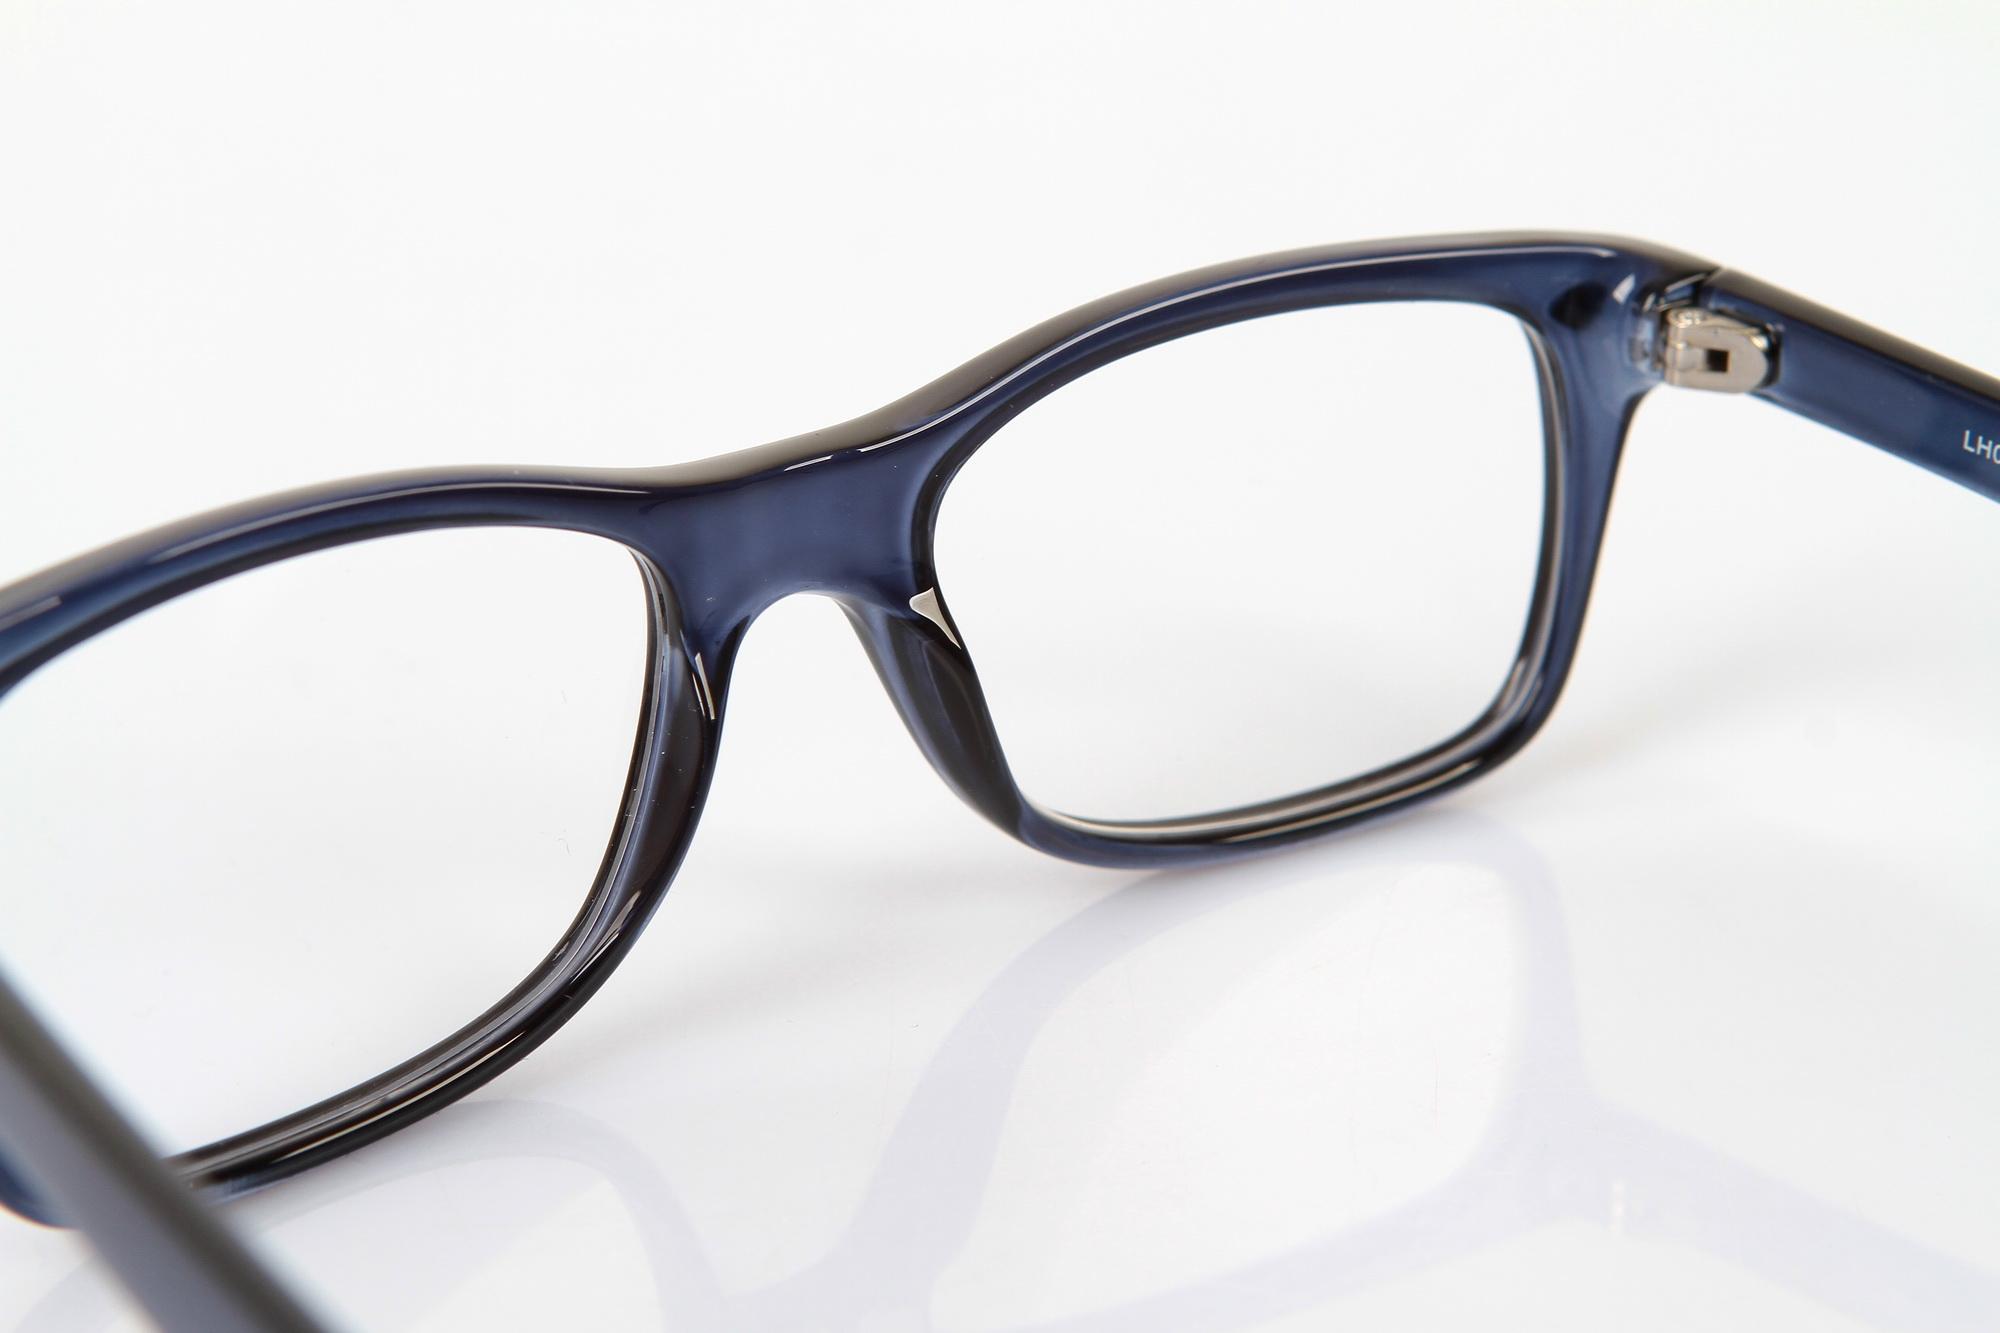 Glasses Frames Quotes : Eyeglasses Quotes. QuotesGram